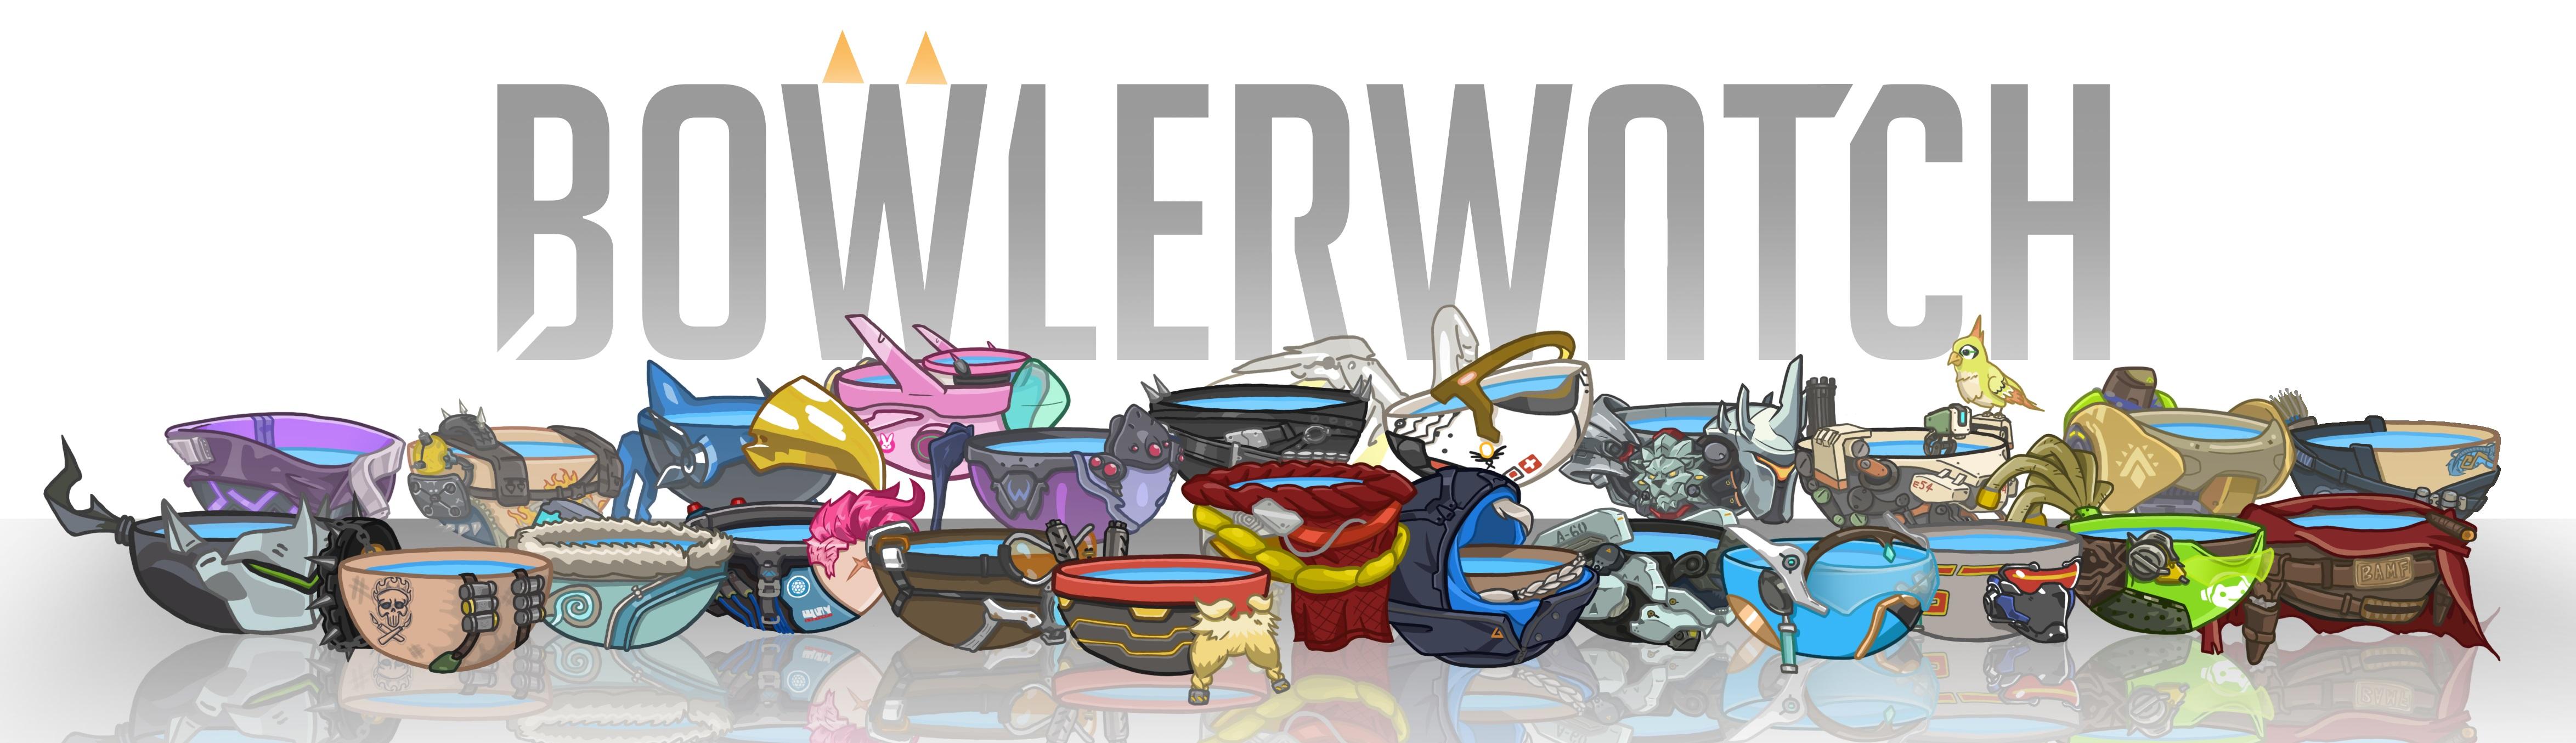 Overwatch Bowlerwatch